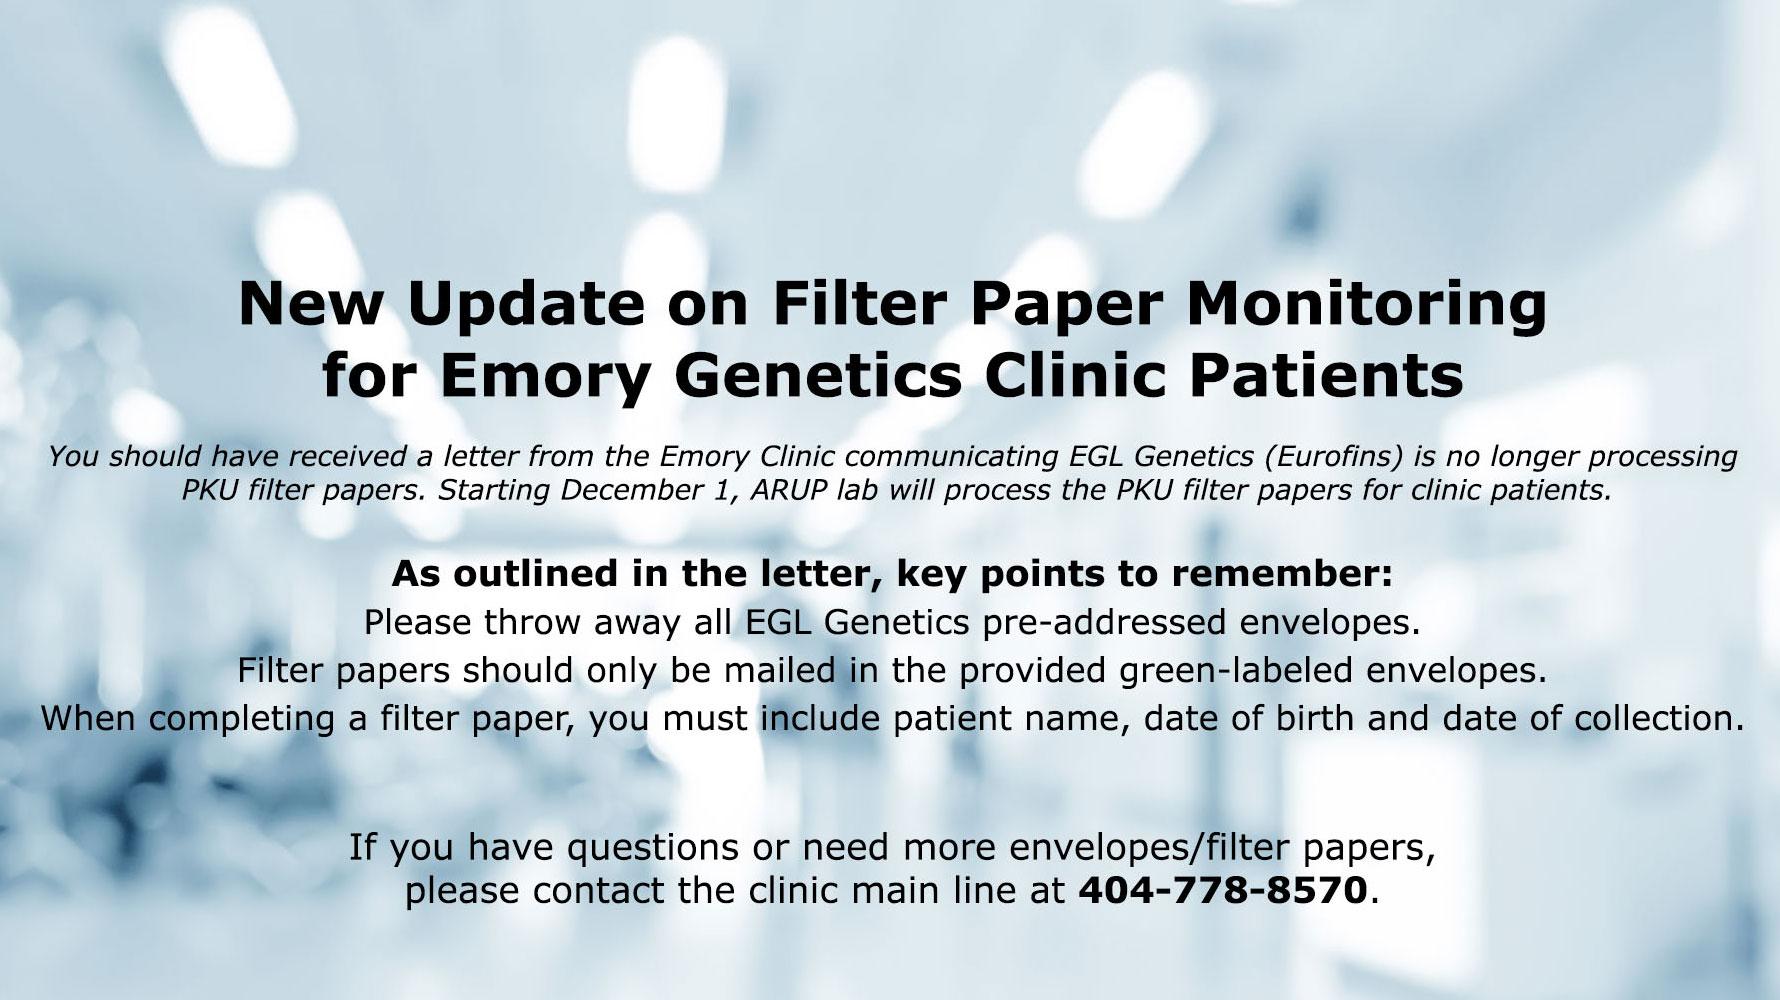 mnt4pBG-filter-paper-update2